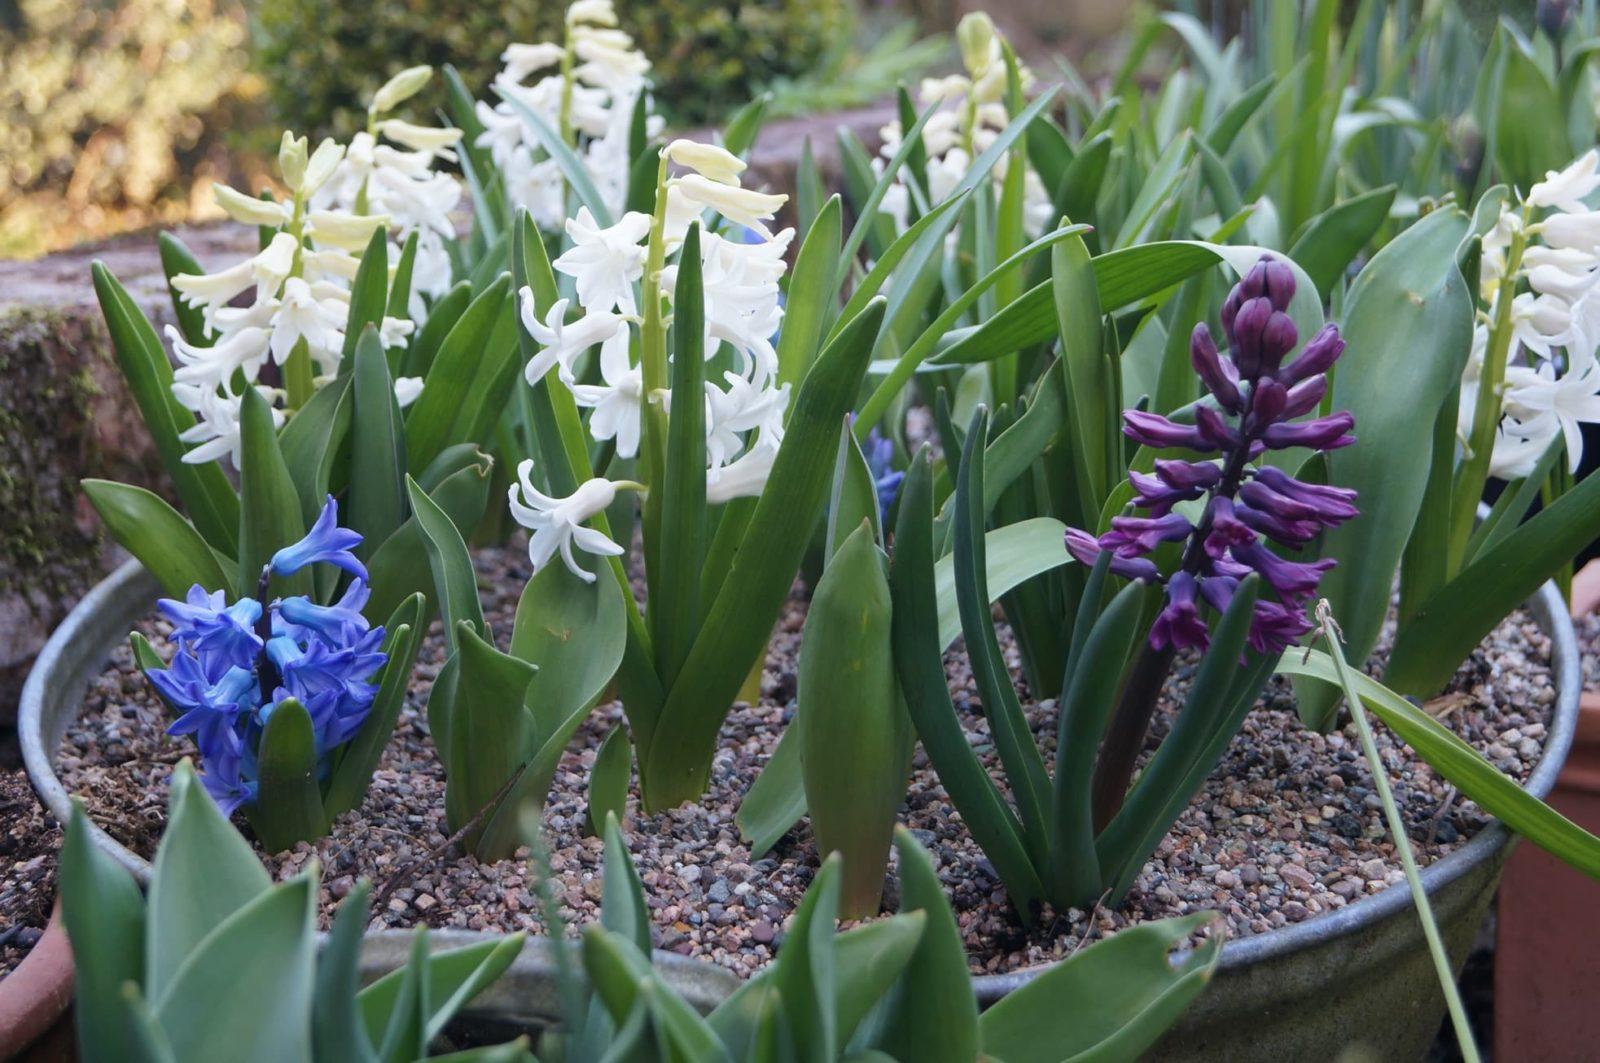 hyacinths, tulips and allium planted in a tin bath bulb lasagne